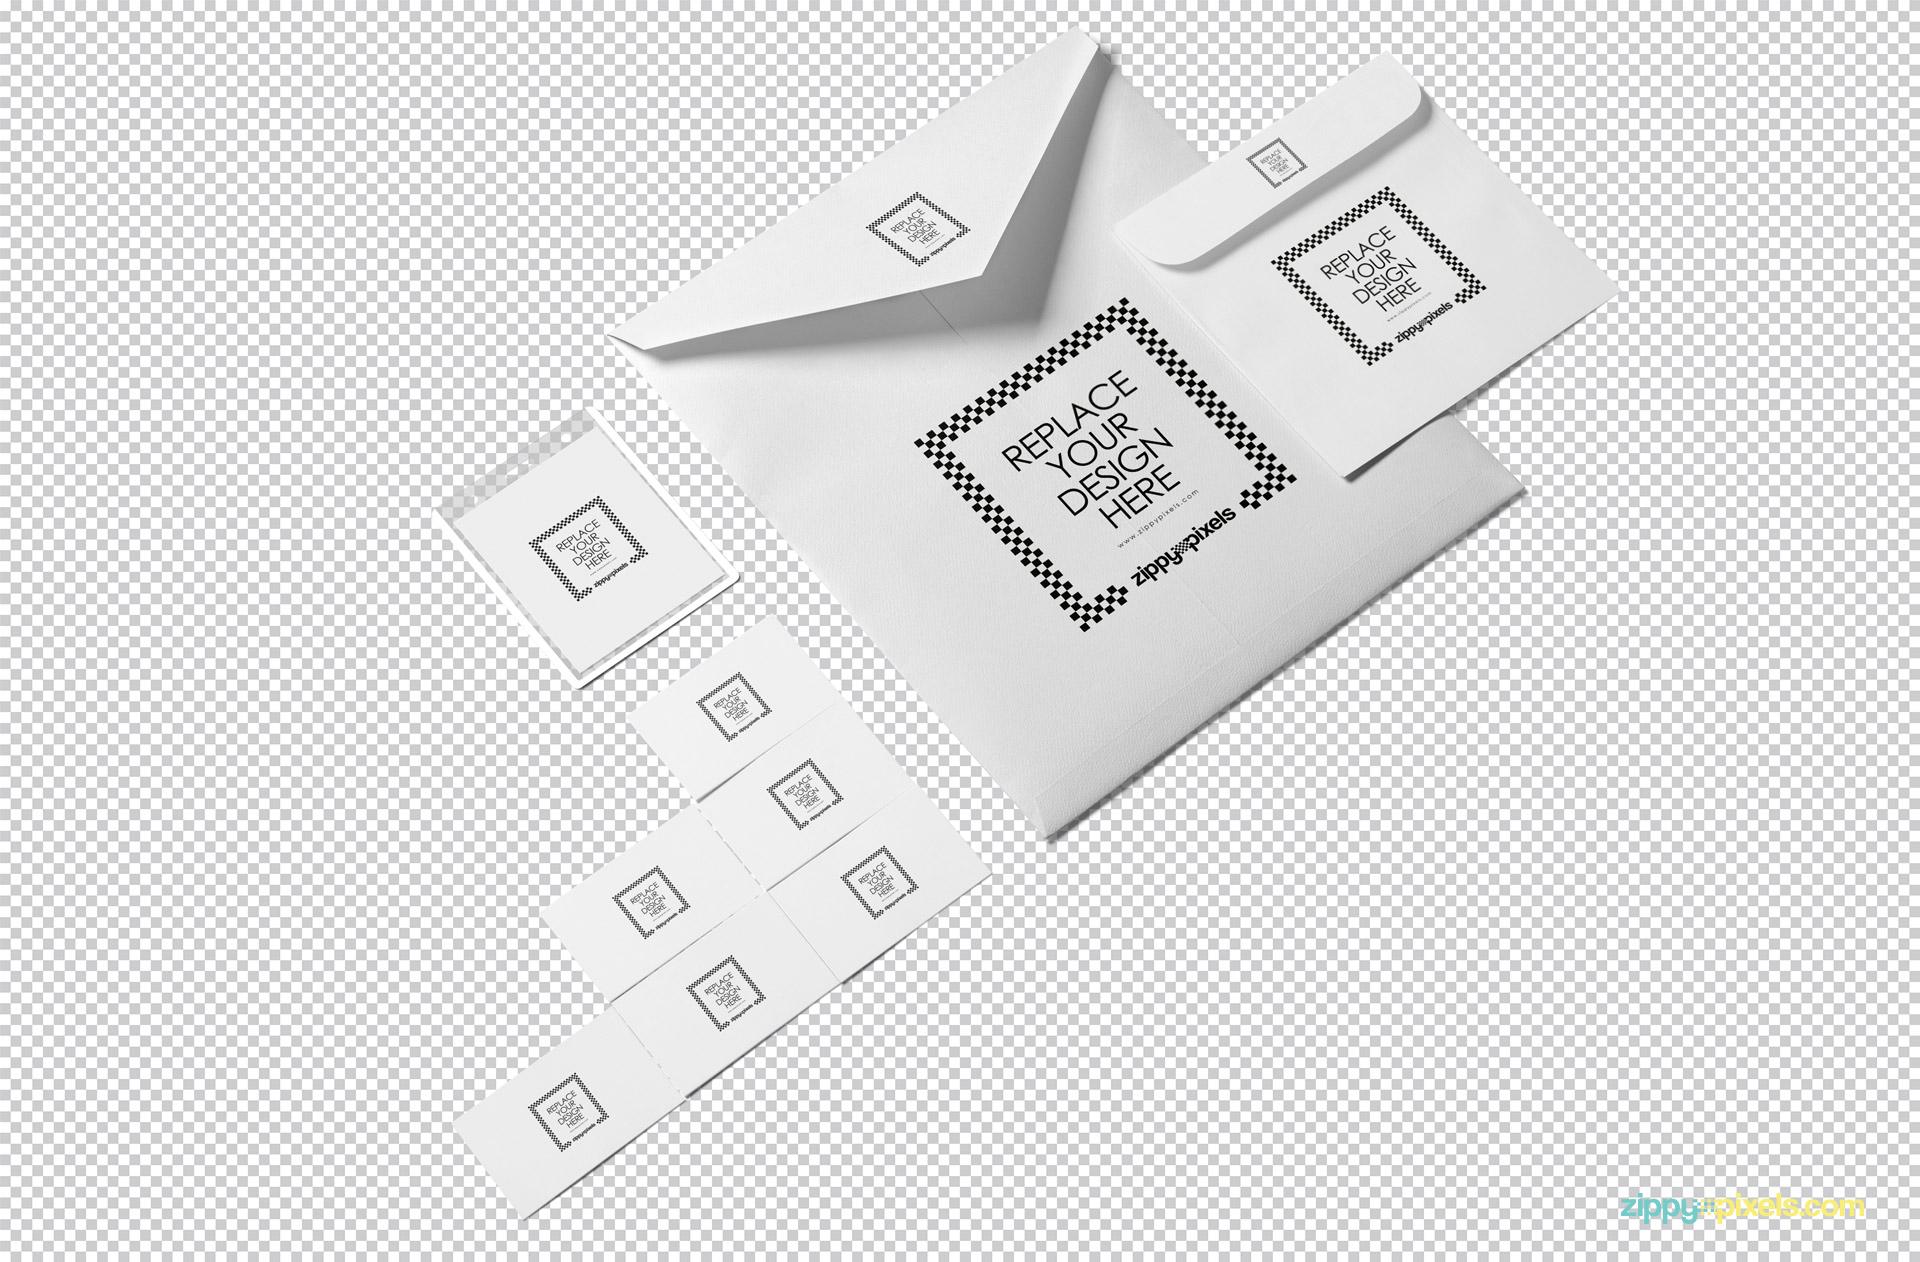 Plain white stationery mockup isolated with the greyscale background.